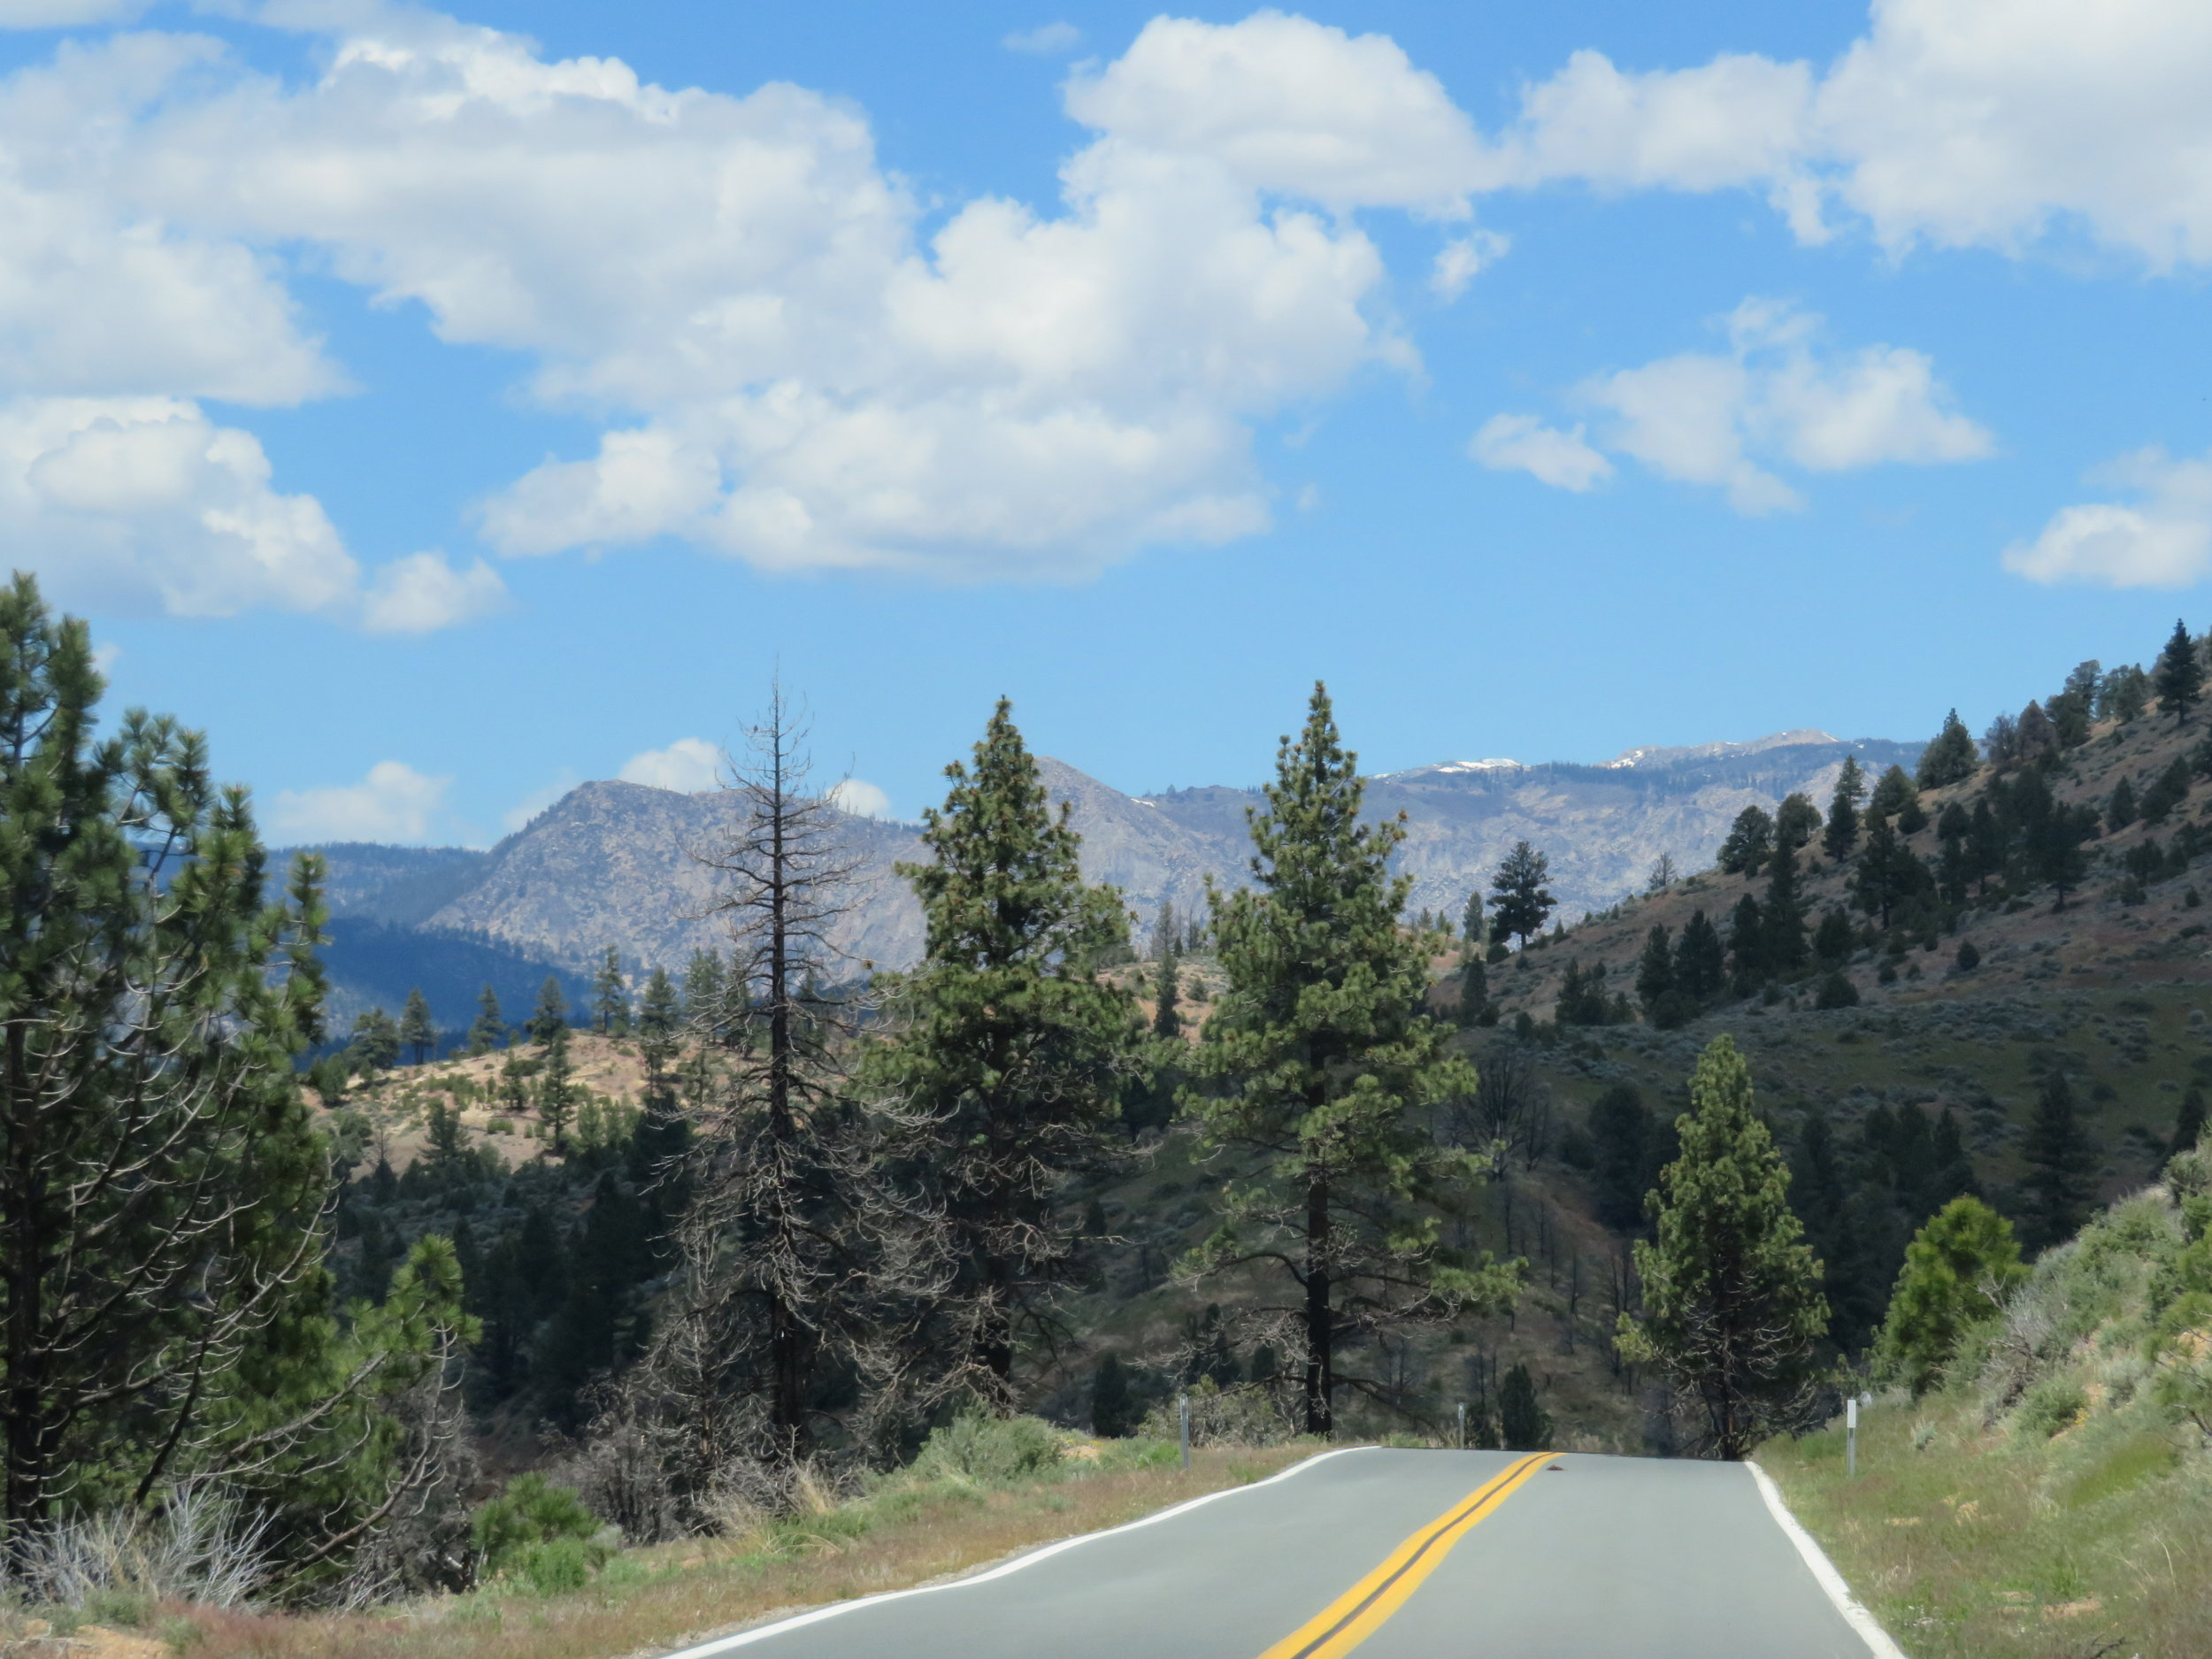 Scenic CA-4 heading over the Sierra Nevadas